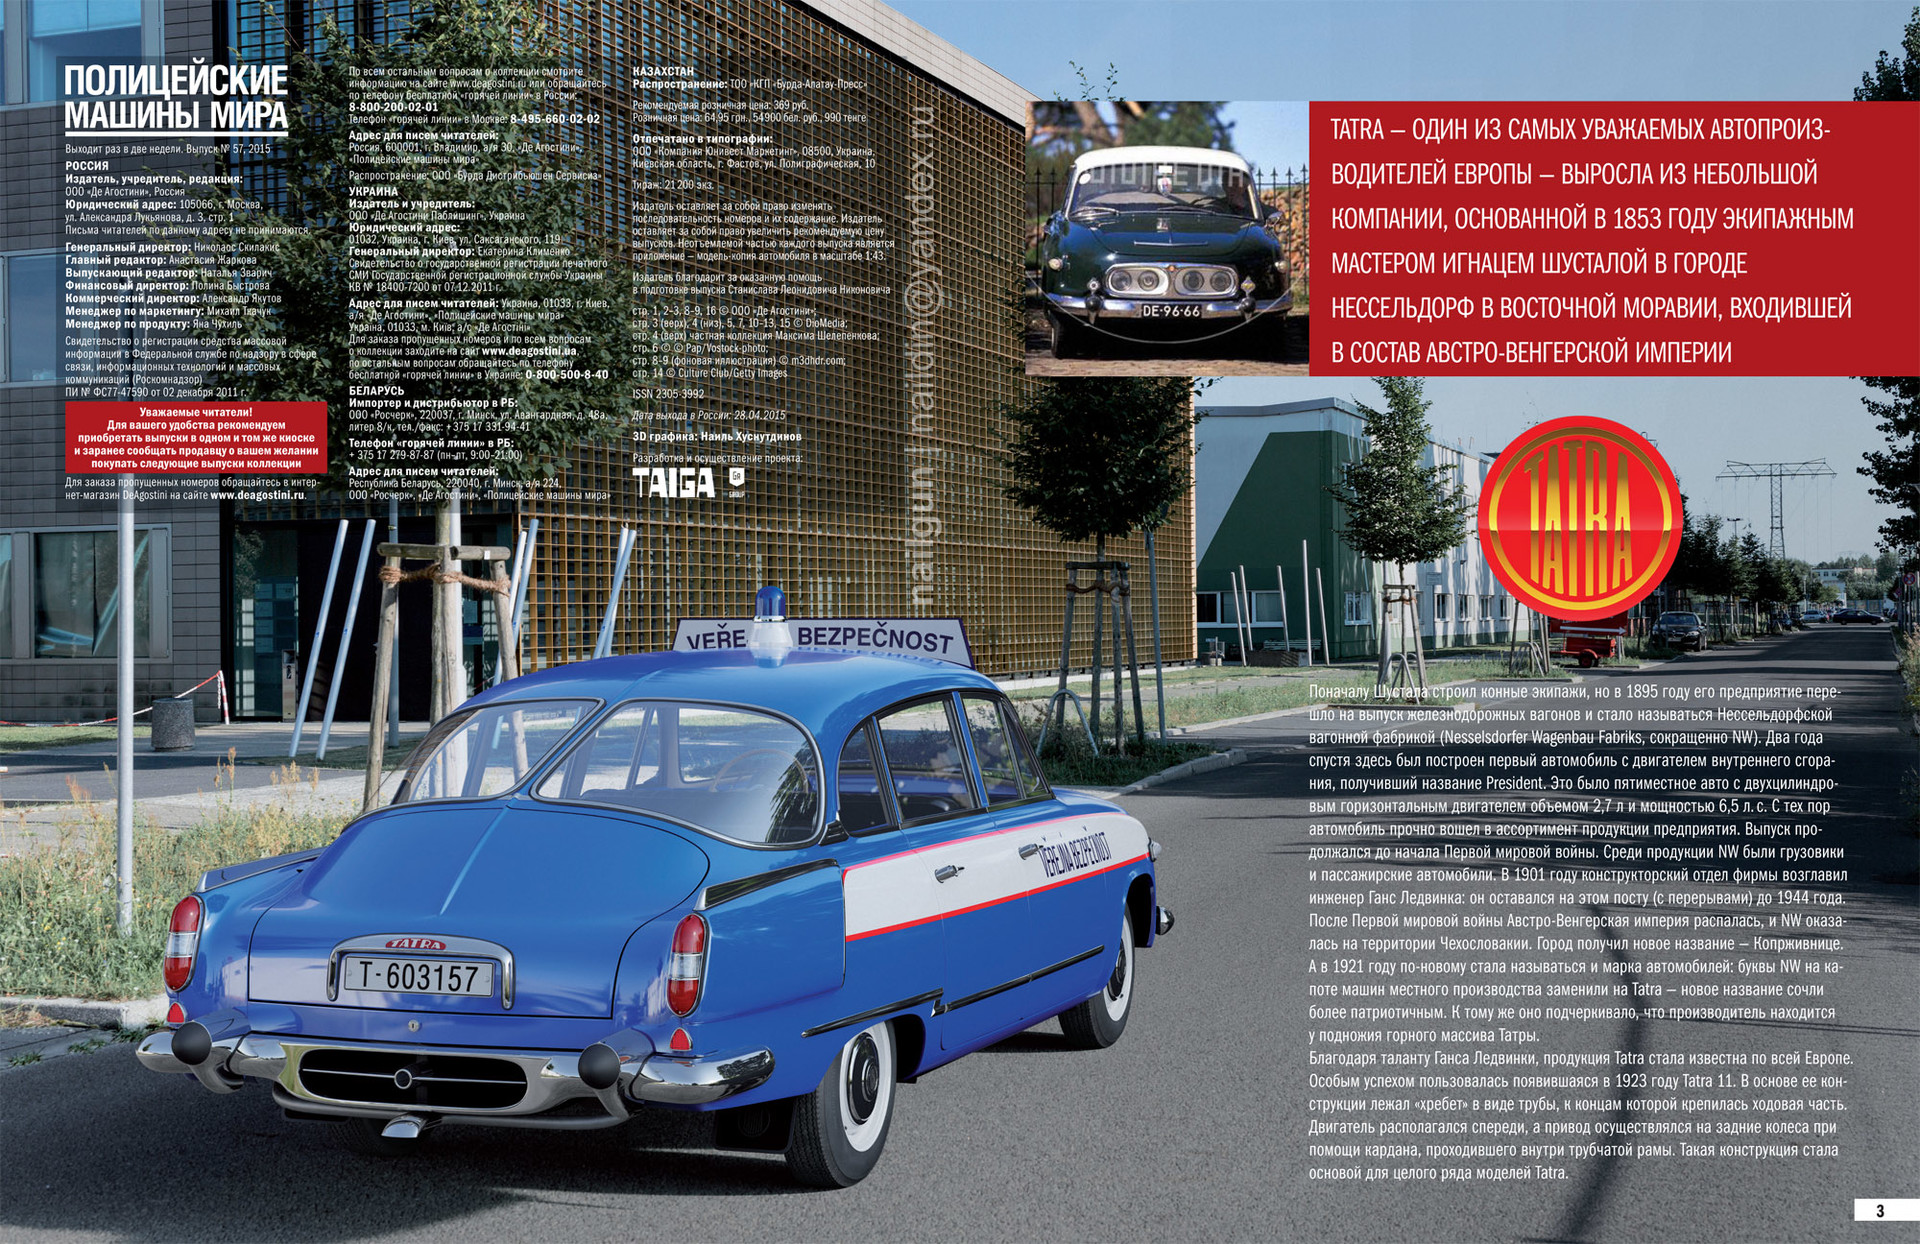 Nail khusnutdinov policecars 57 hires 2